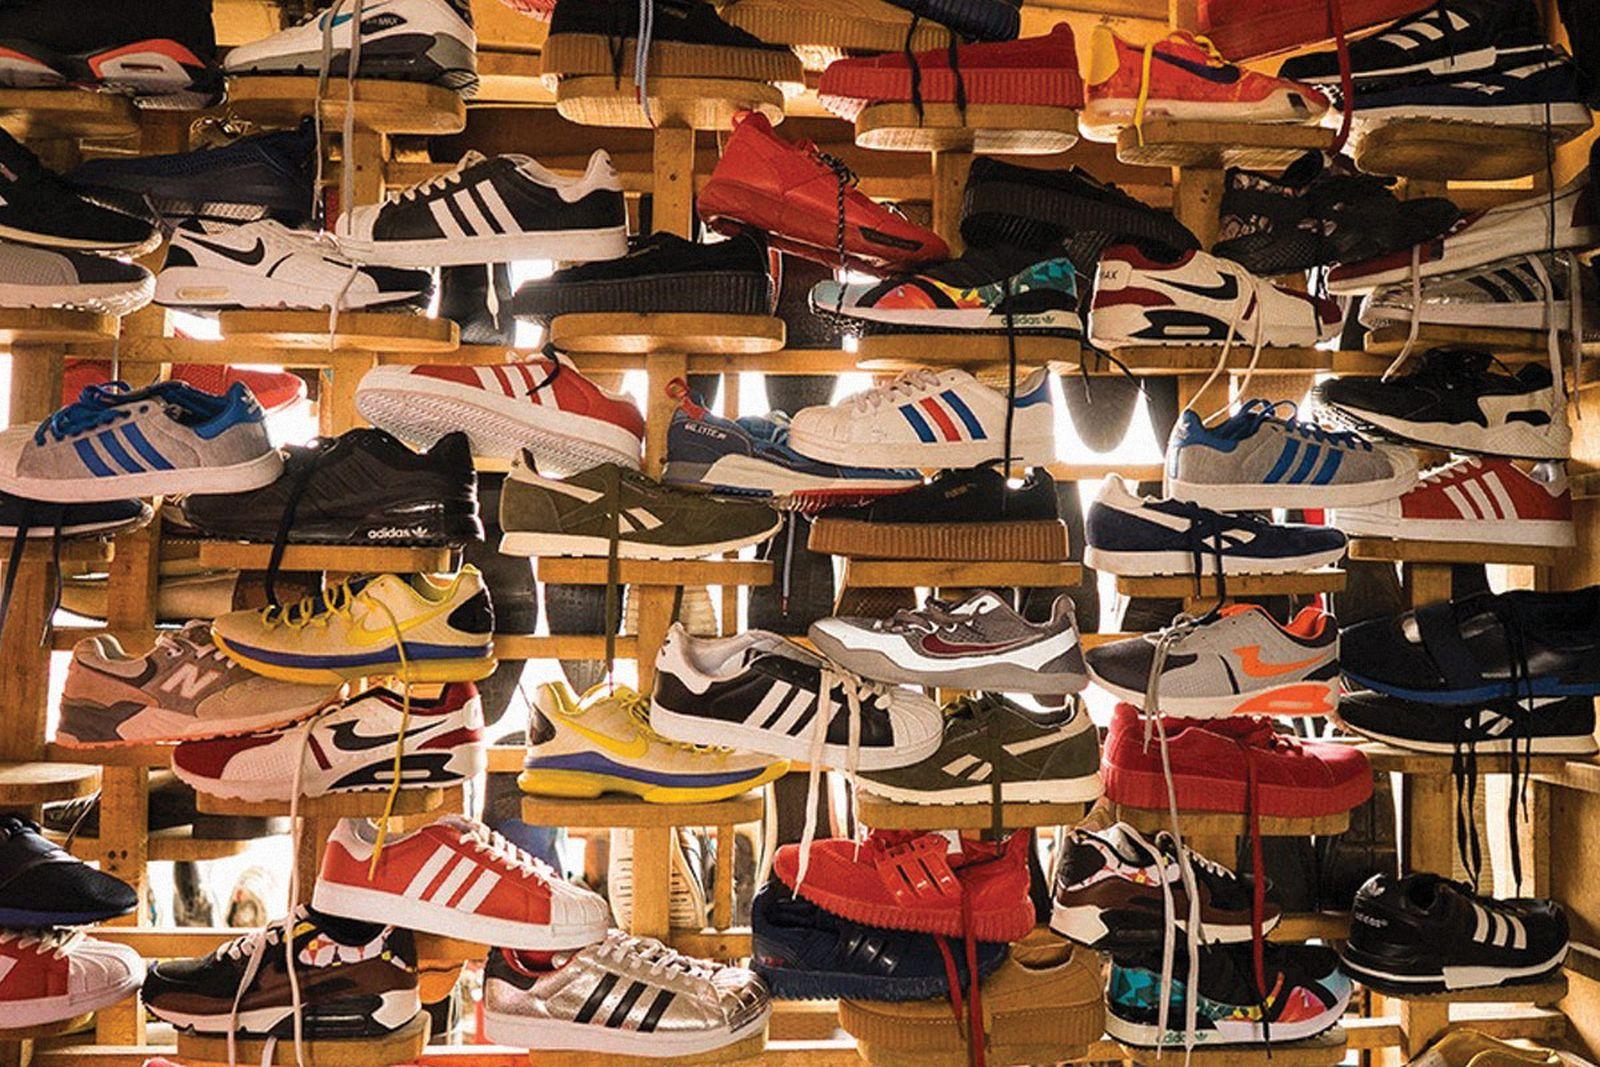 counterfeiting good fashion main knock-offs